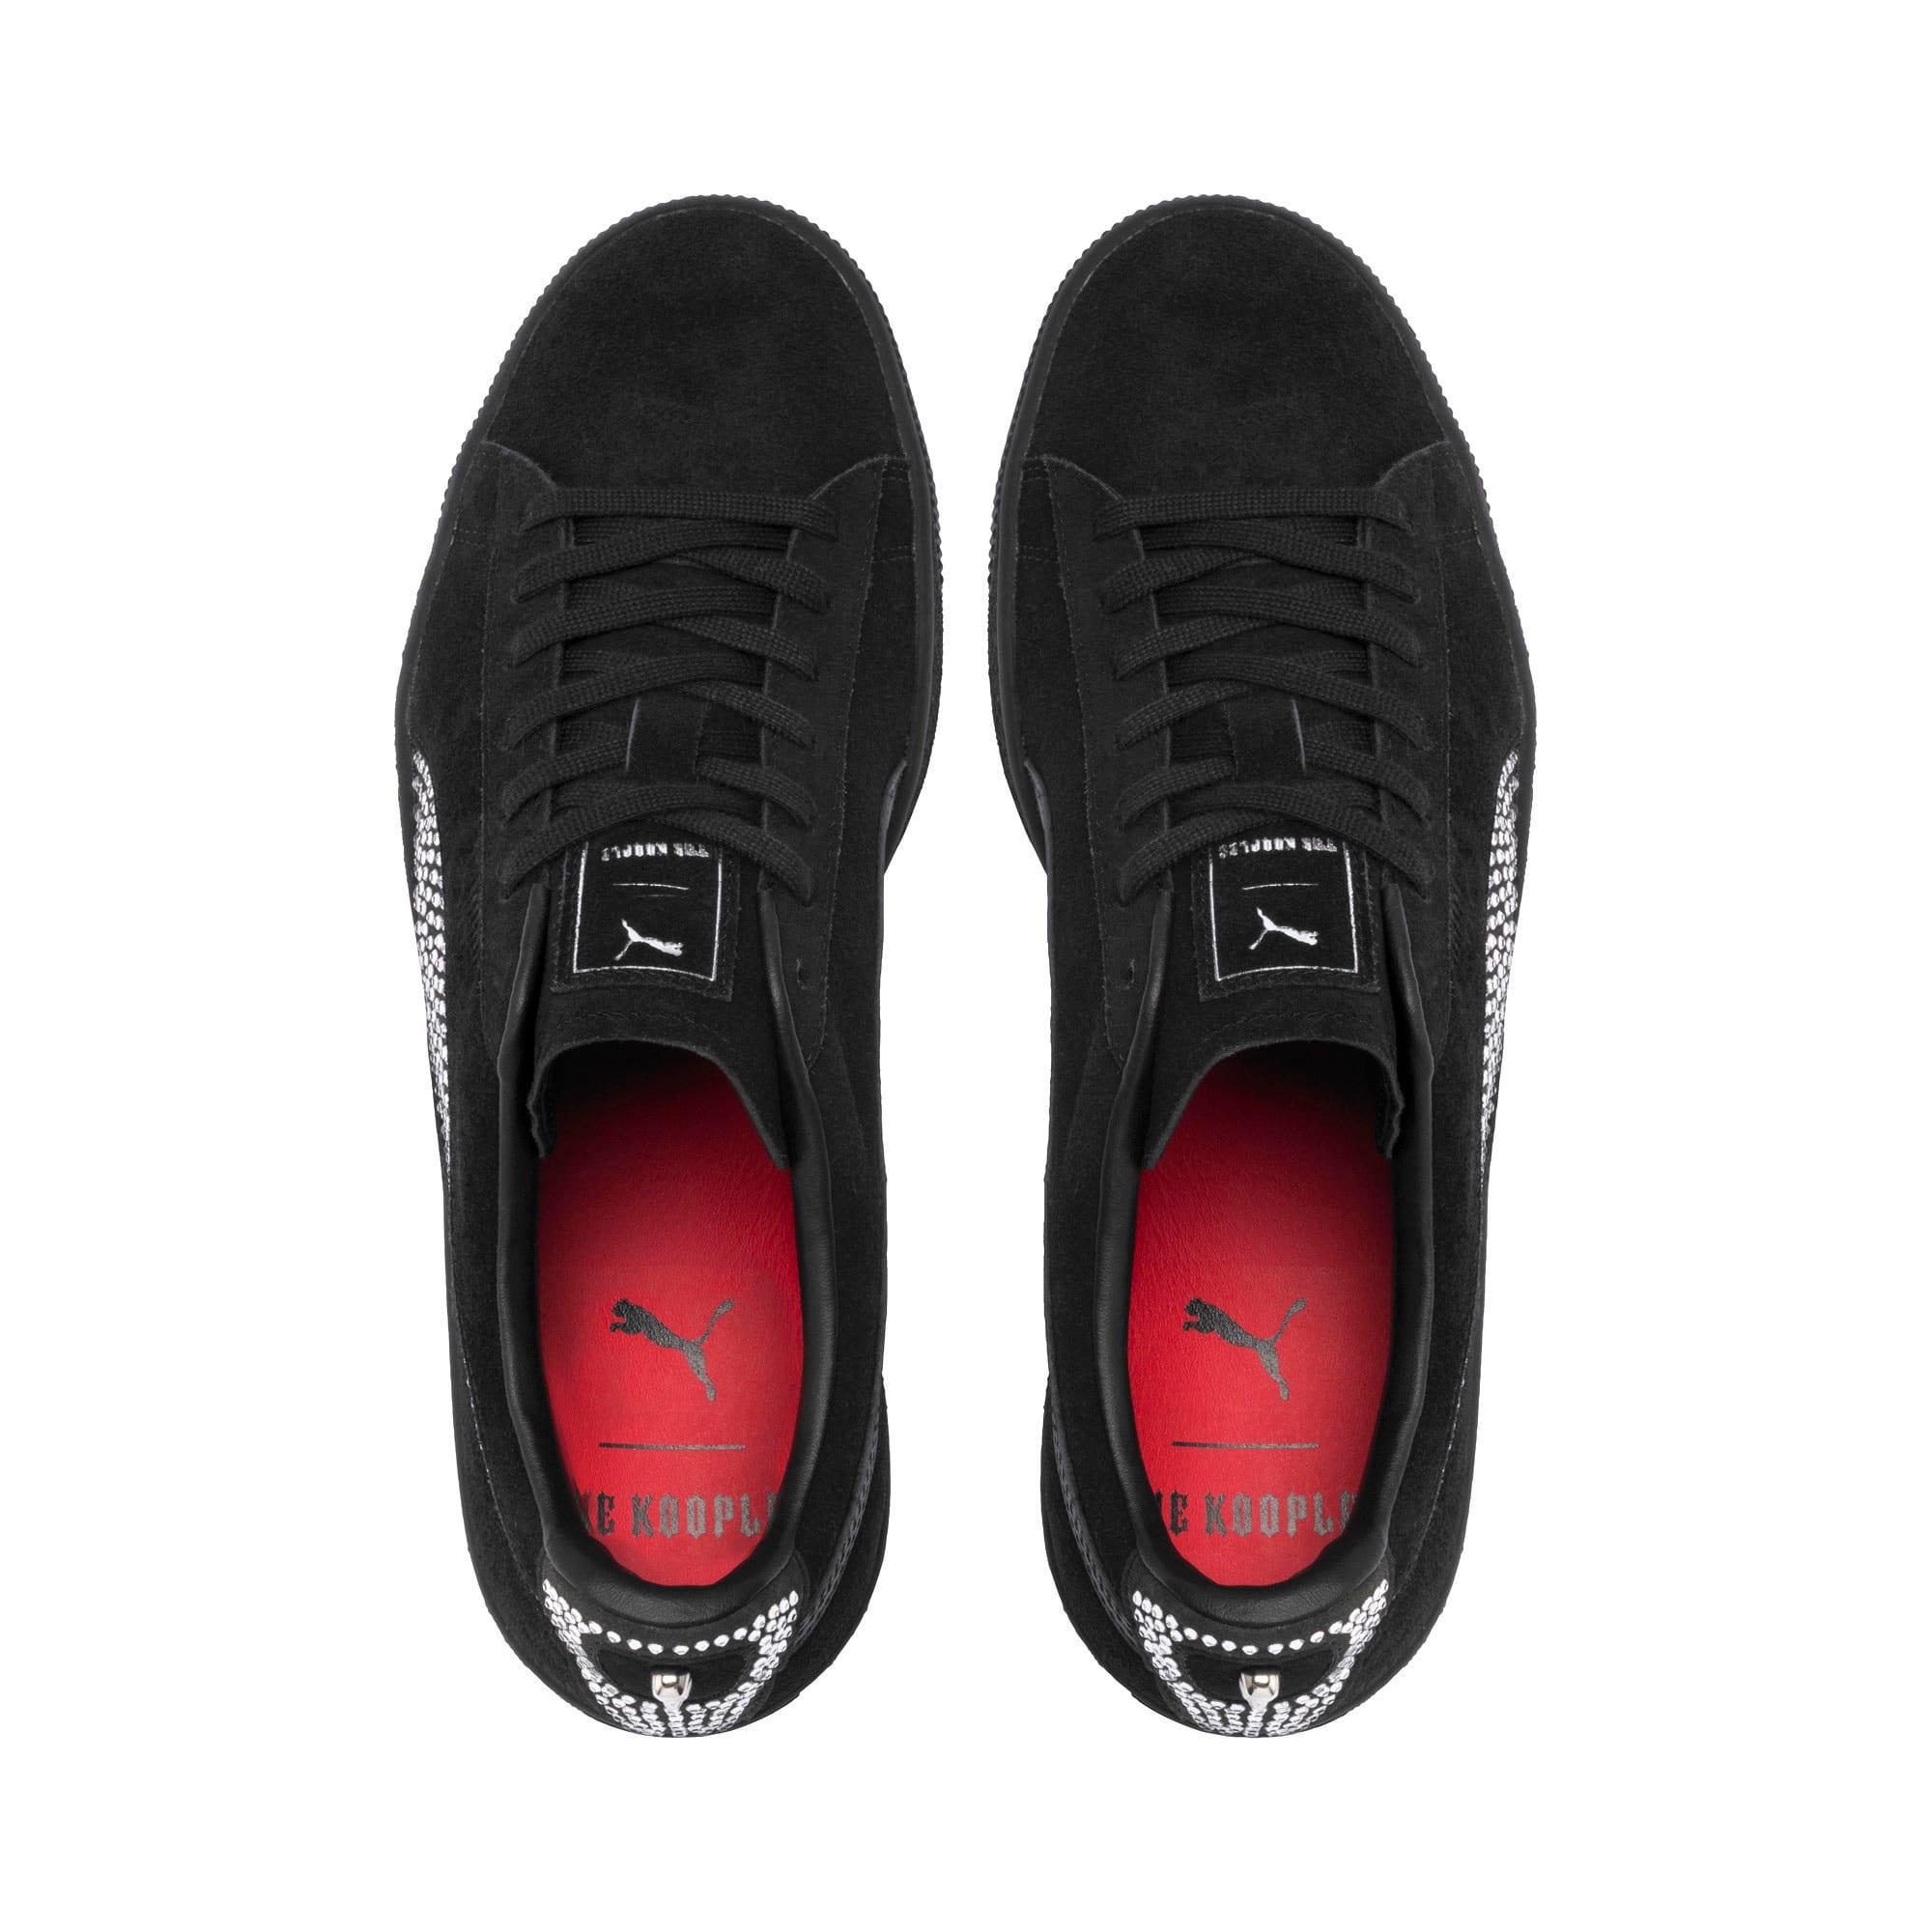 Miniatura 6 de Zapatos deportivos de gamuza PUMA x THE KOOPLES, Puma Black, mediano